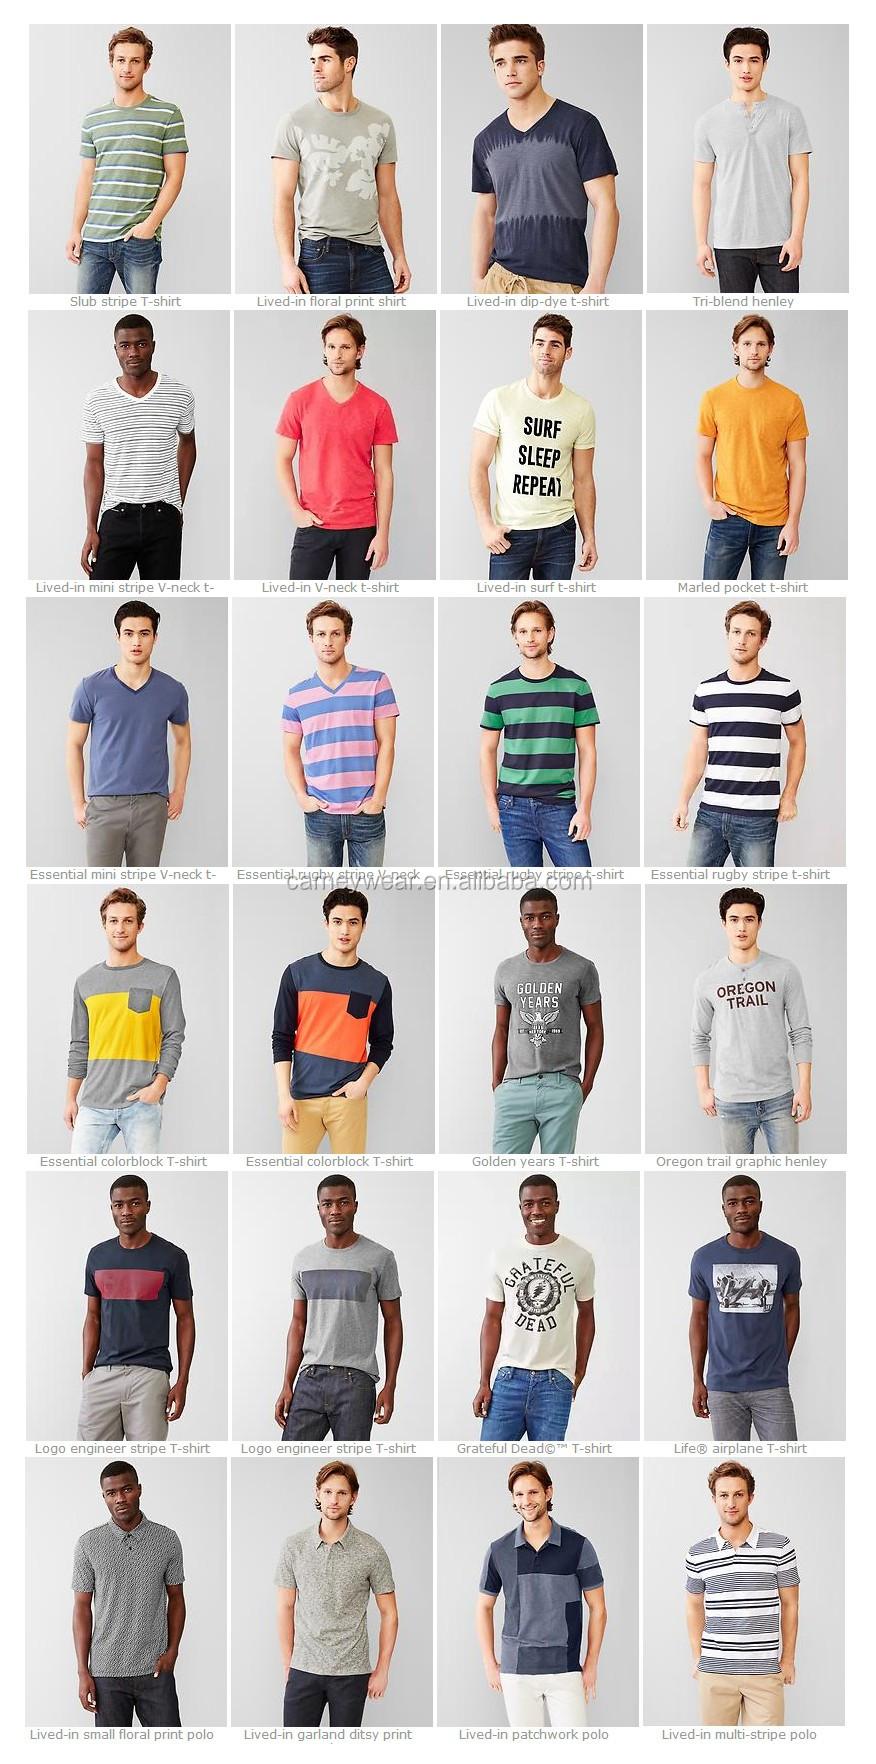 Design your own t shirt digital printing - Sublimation Digital Printing Custom Your Own Logo Cotton Men T Shirt Dtg Printer For T